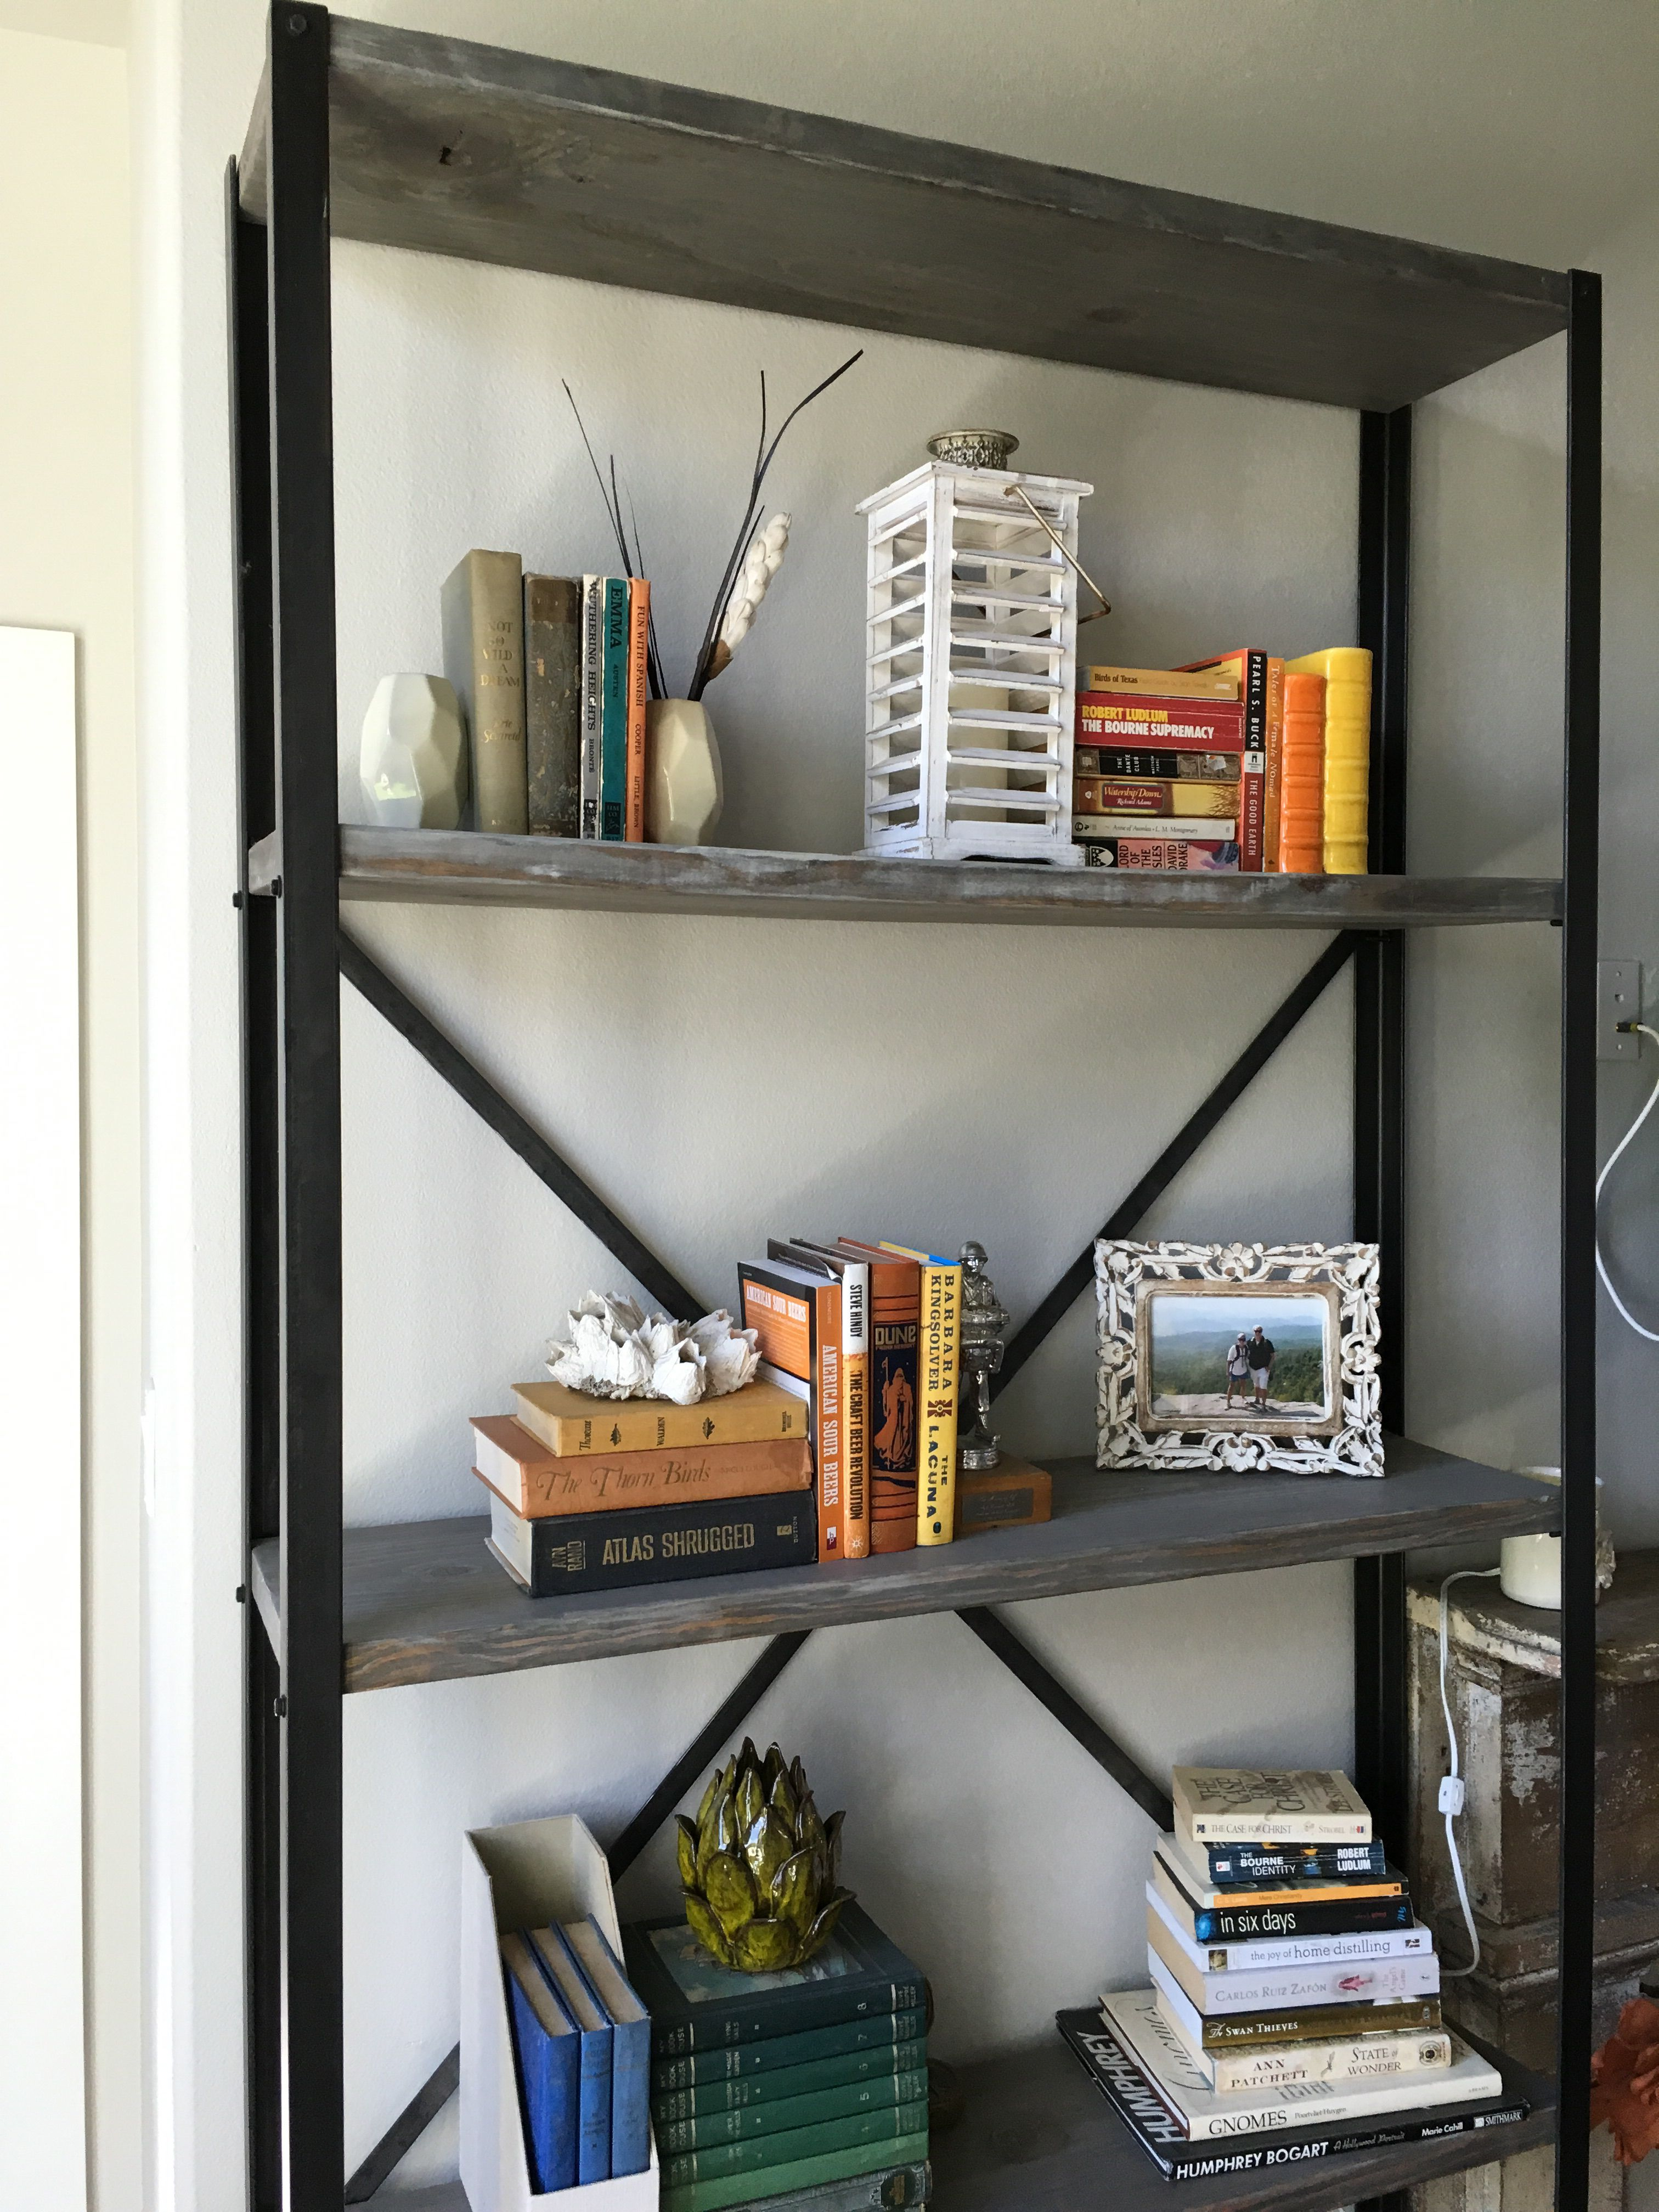 DIY - Restoration Hardware angle-iron bookshelf for <$100